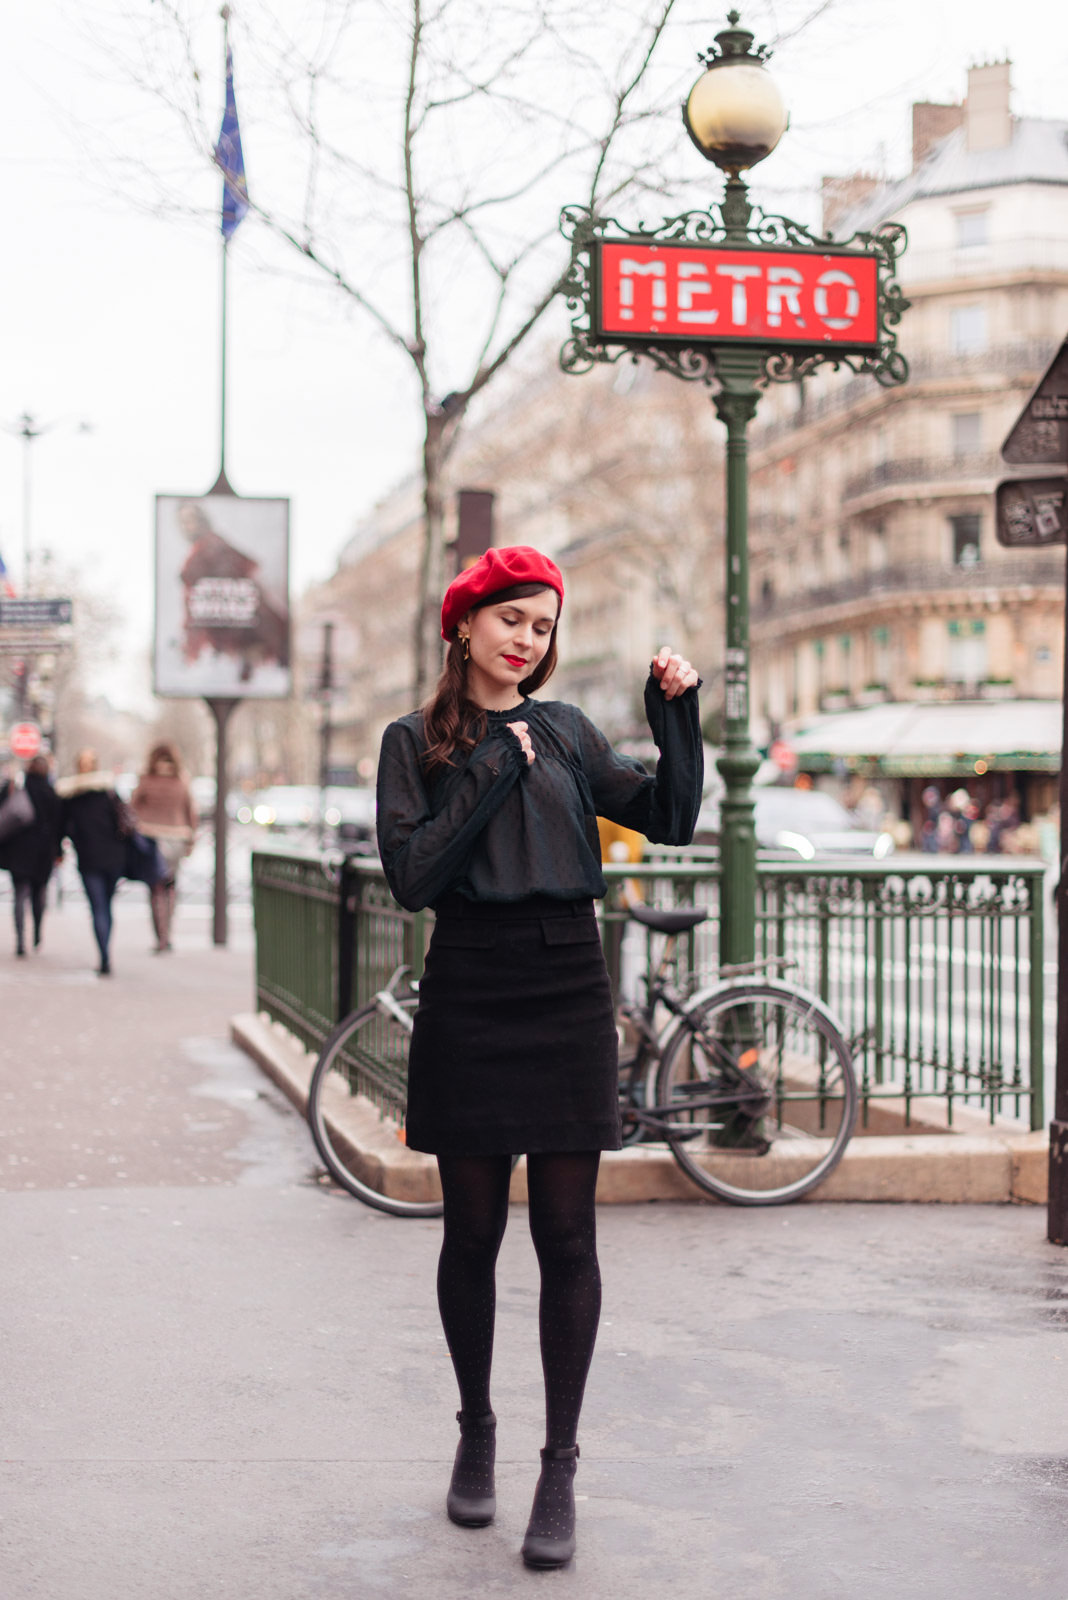 Blog-Mode-And-The-City-Lifestyle-Wishlist-soldes-monoprix-2018-8